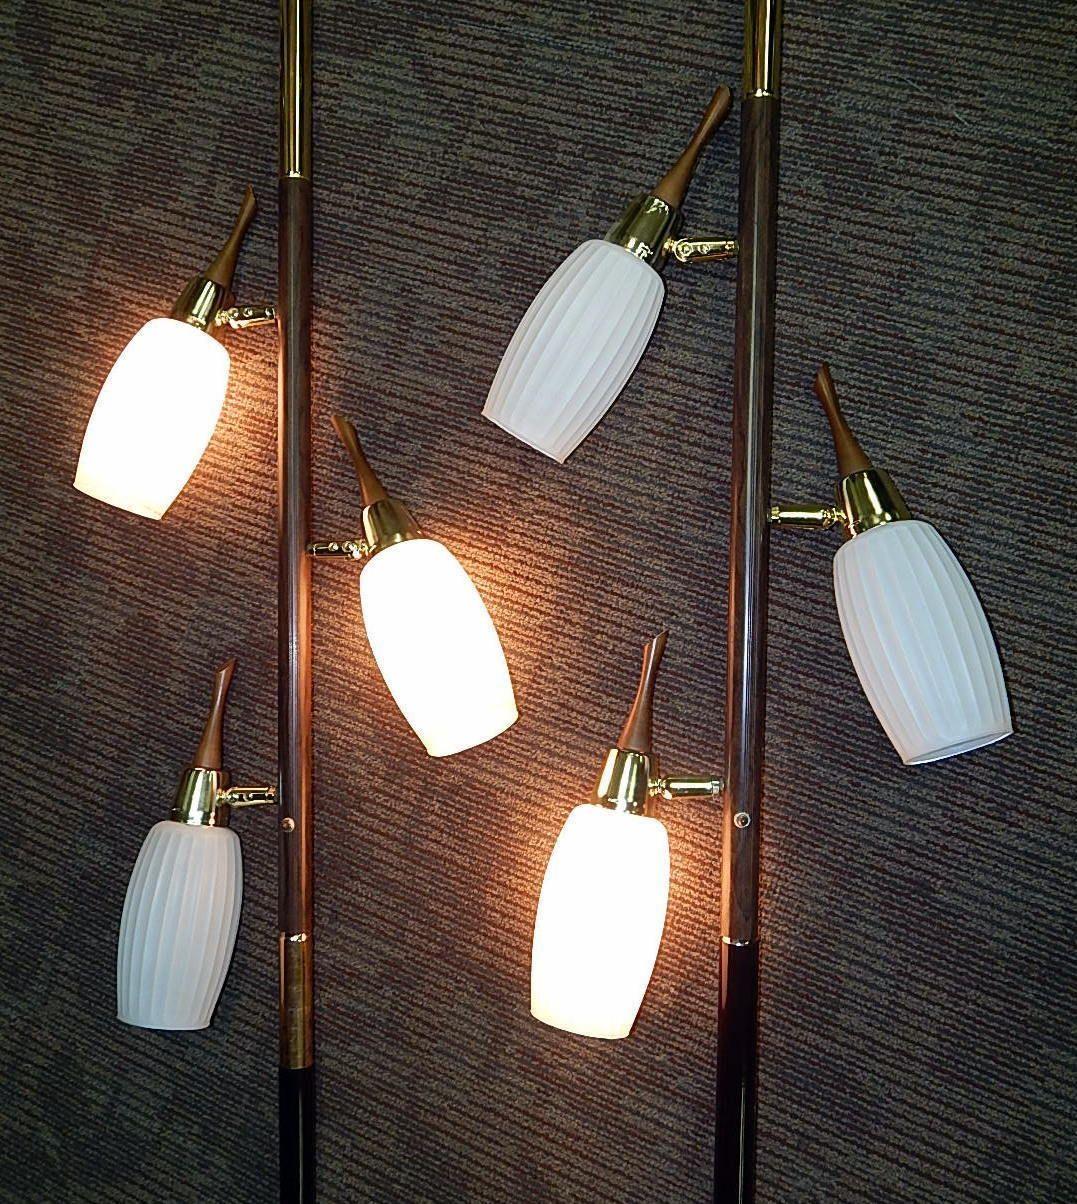 Peachy Two Mid Century Spring Tension Pole Floor Lamp Light Retro Mcm Wiring 101 Hateforg